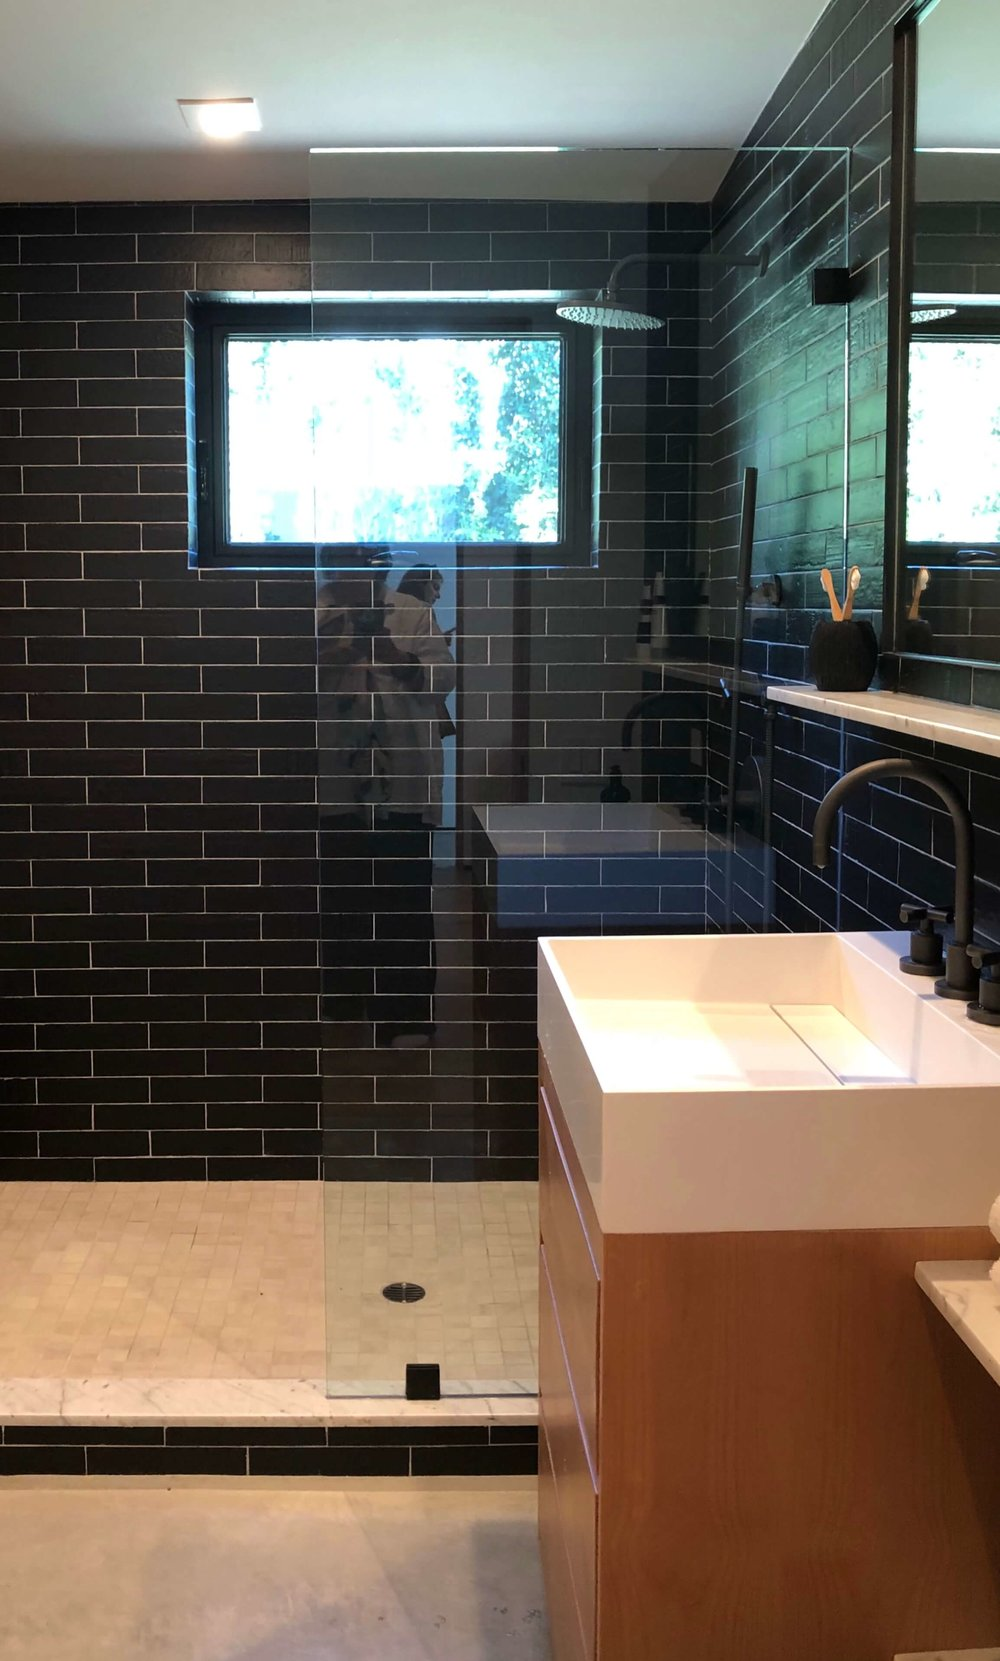 Bathroom in California contemporary home, Dwell on Design's Fall Home Tour, Designer: Vitus Matare #bathroomideas #bathroomdesign